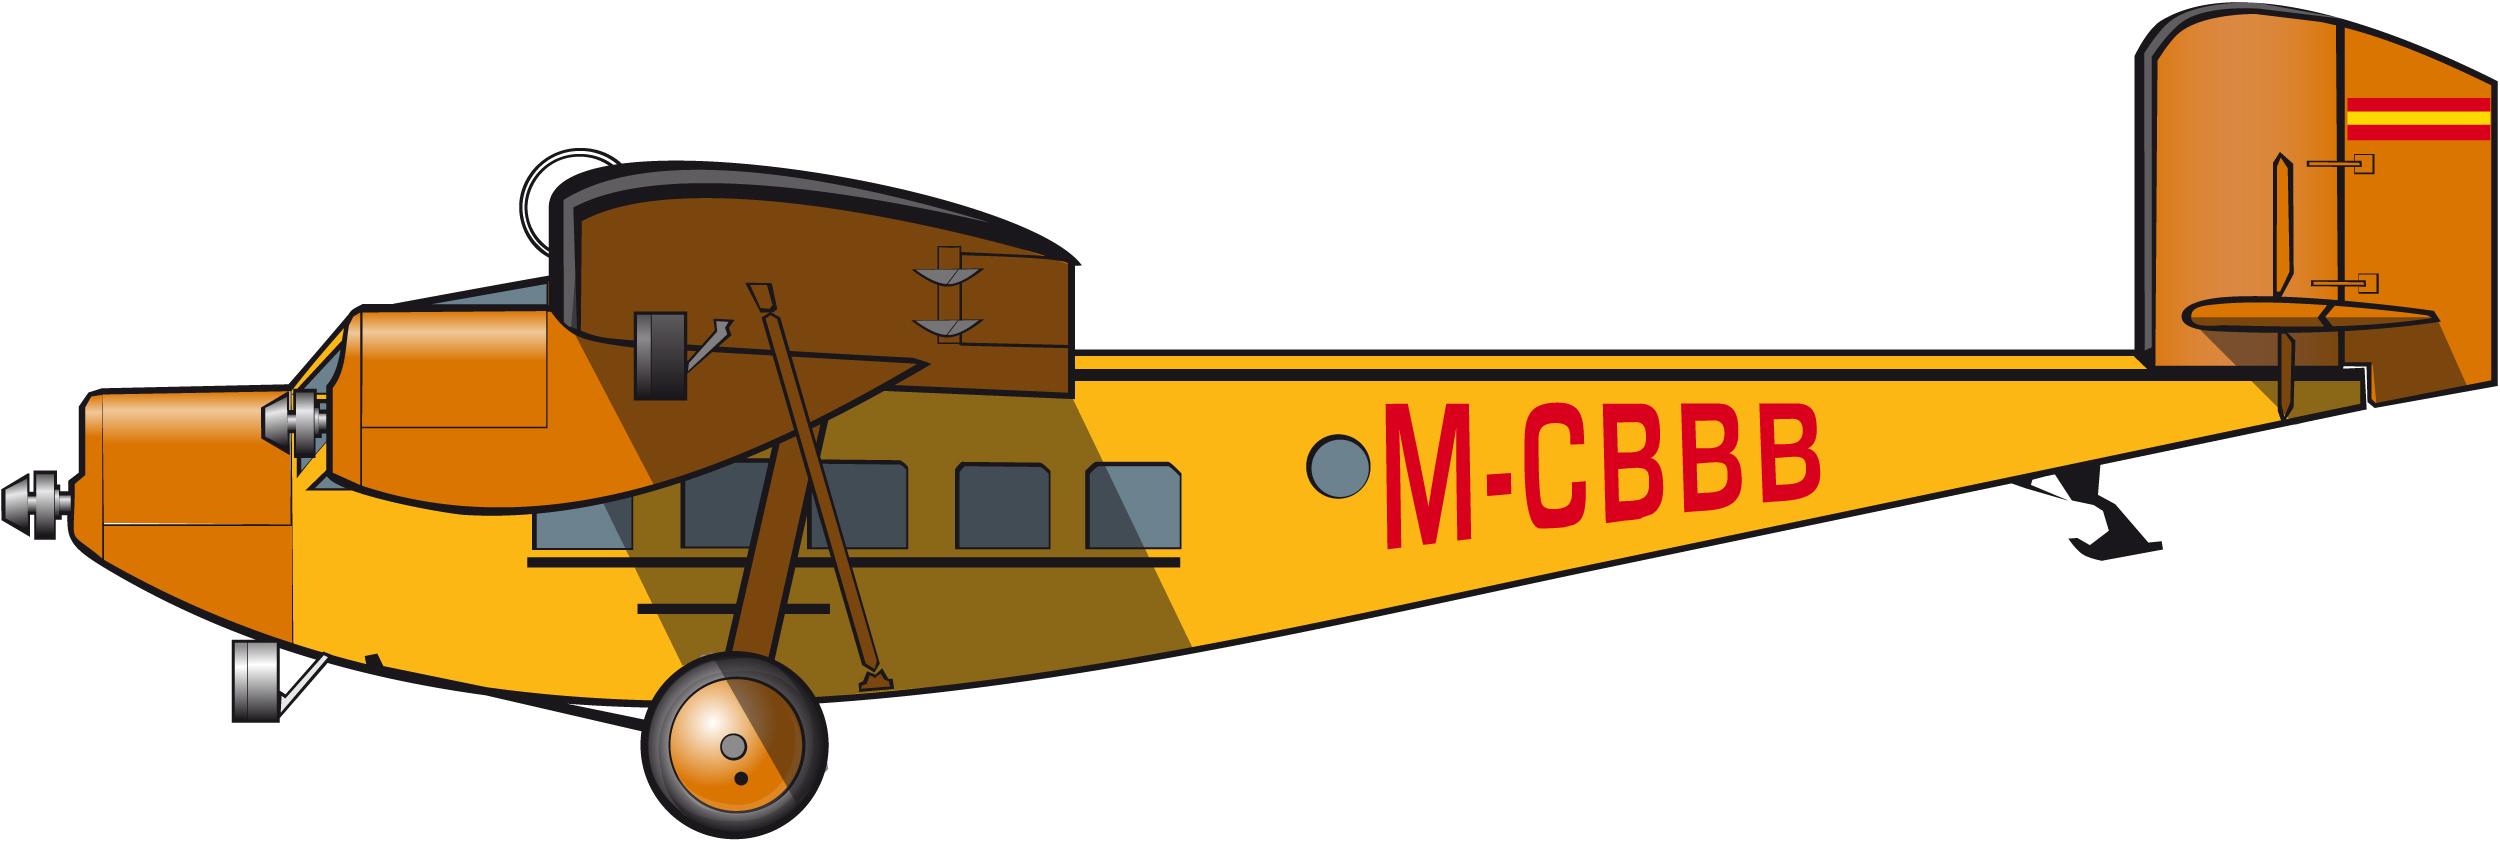 rohrbachrolandiberia1927